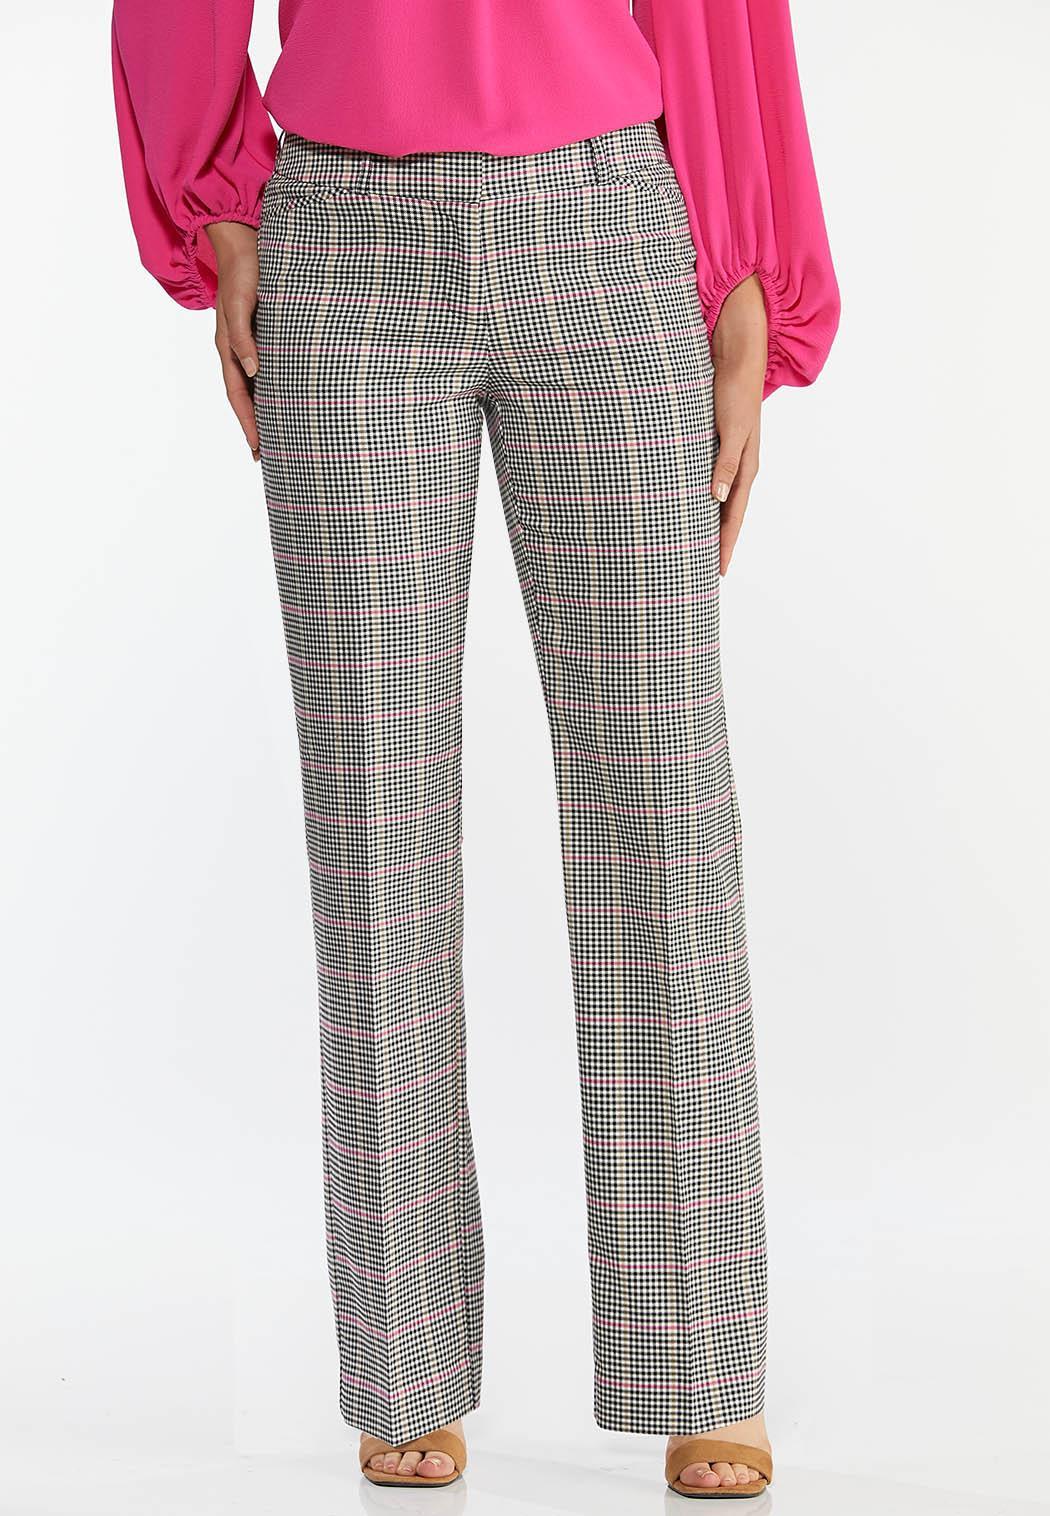 Petite Pink Plaid Trouser Pants